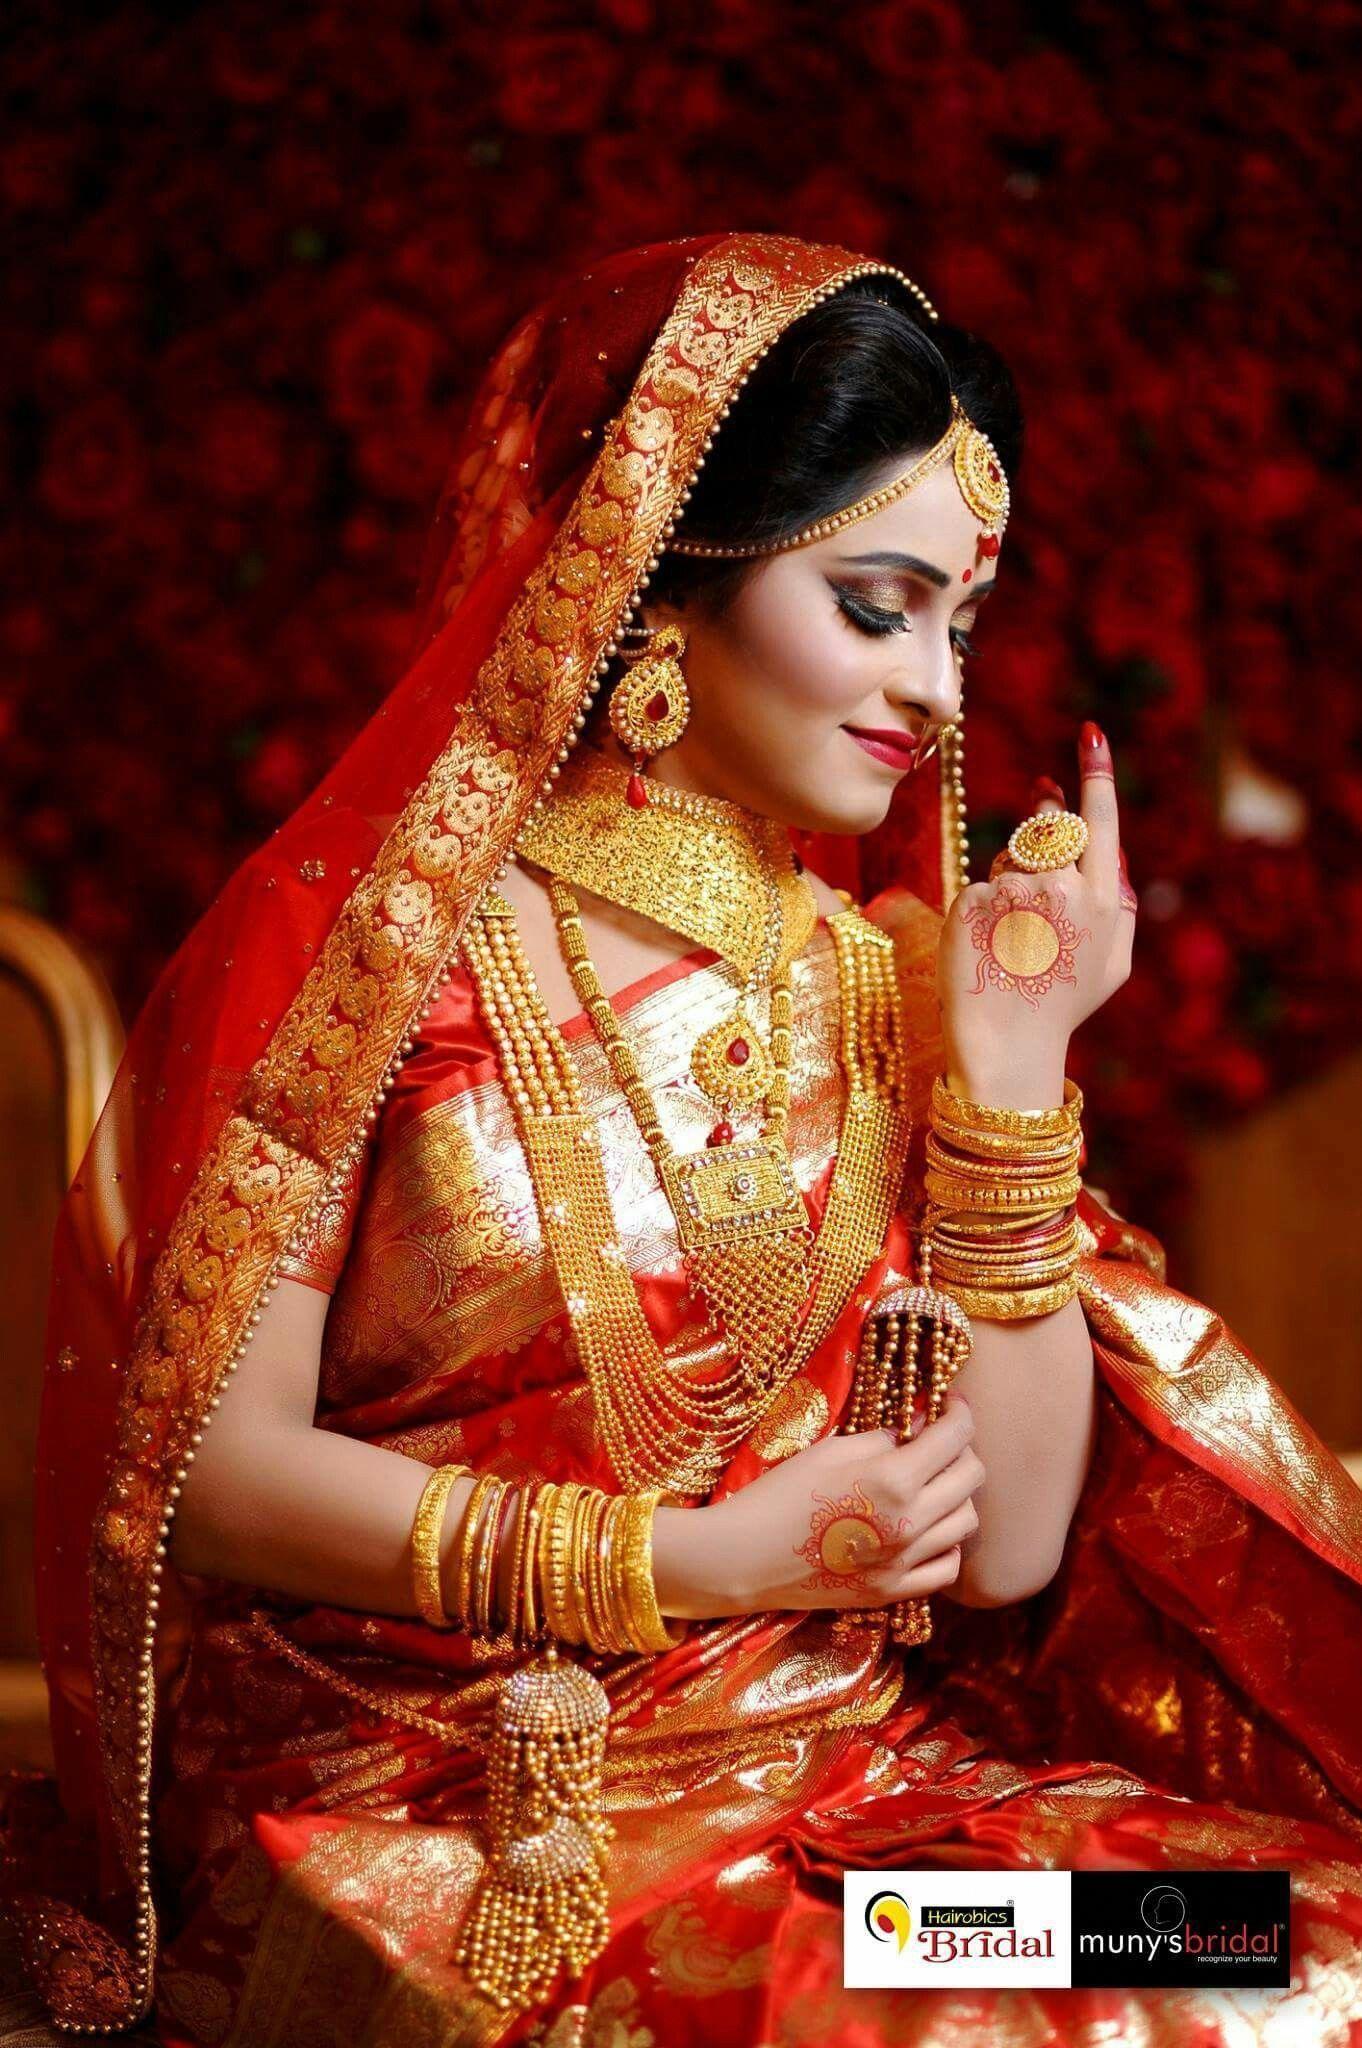 Beautiful wedding women indian wedding poses bengali